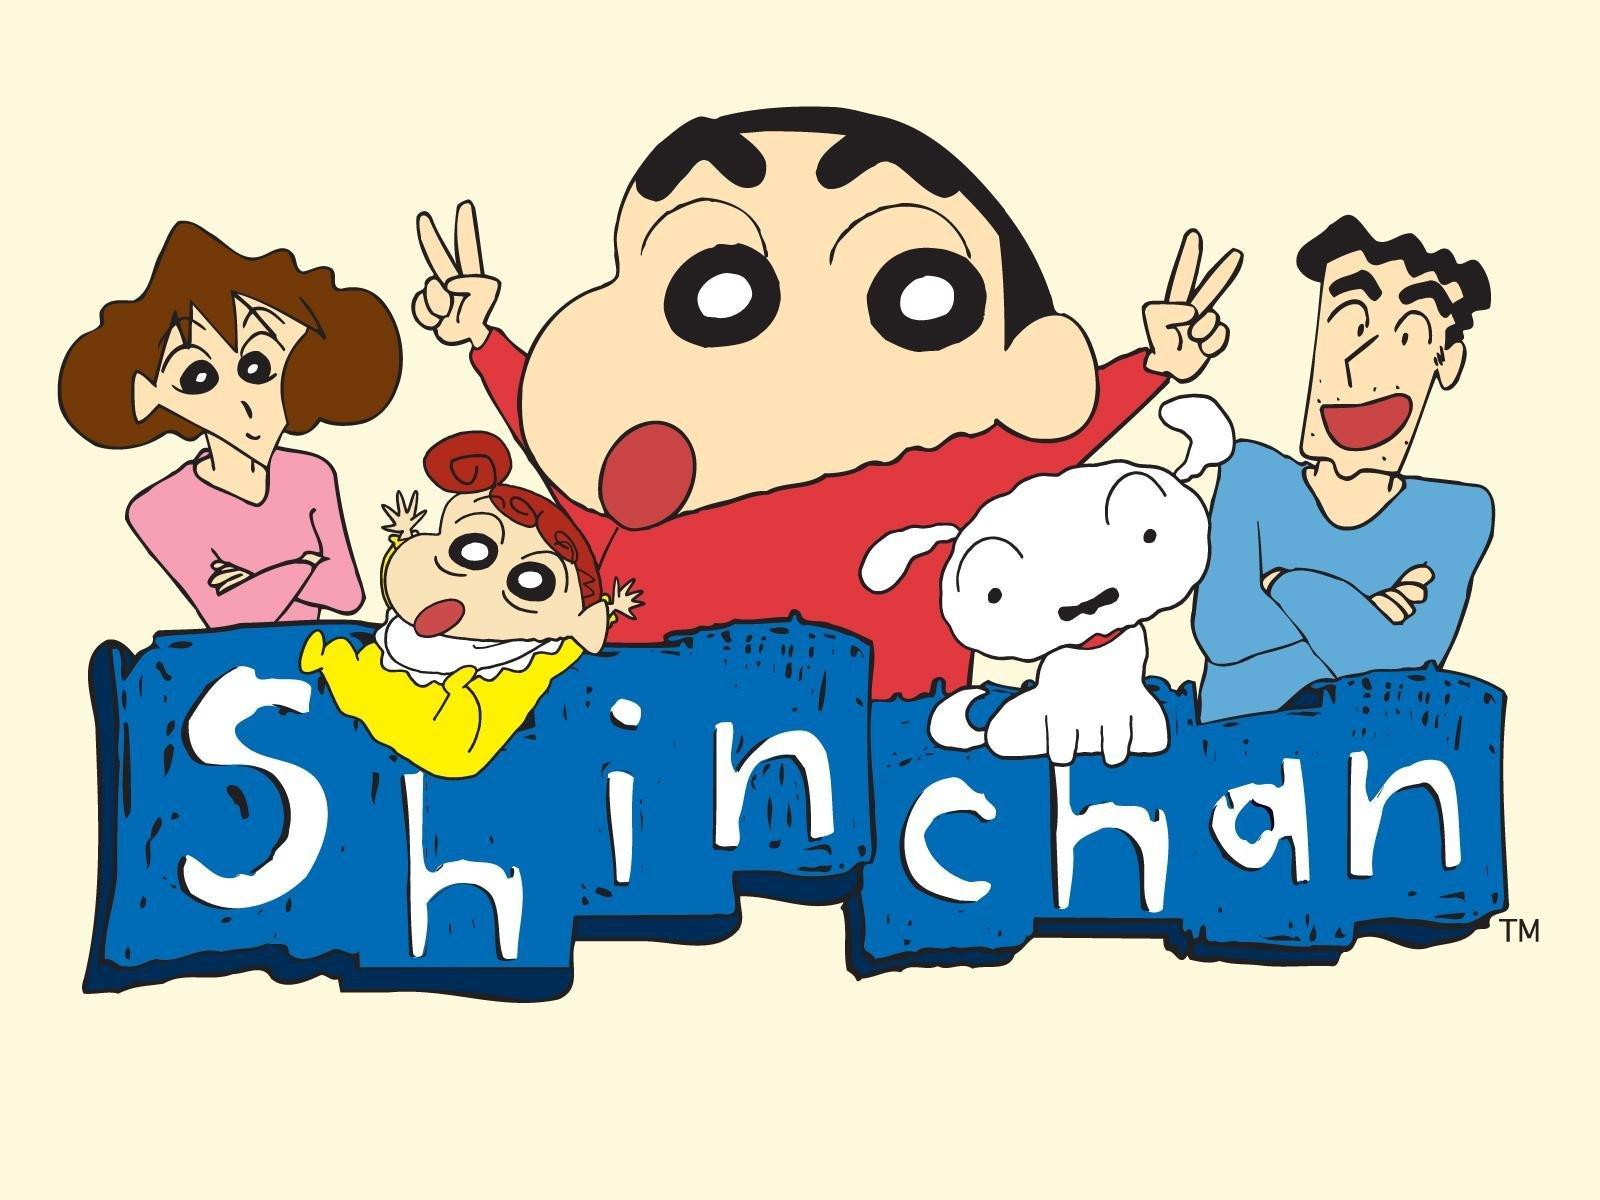 Chin Chan